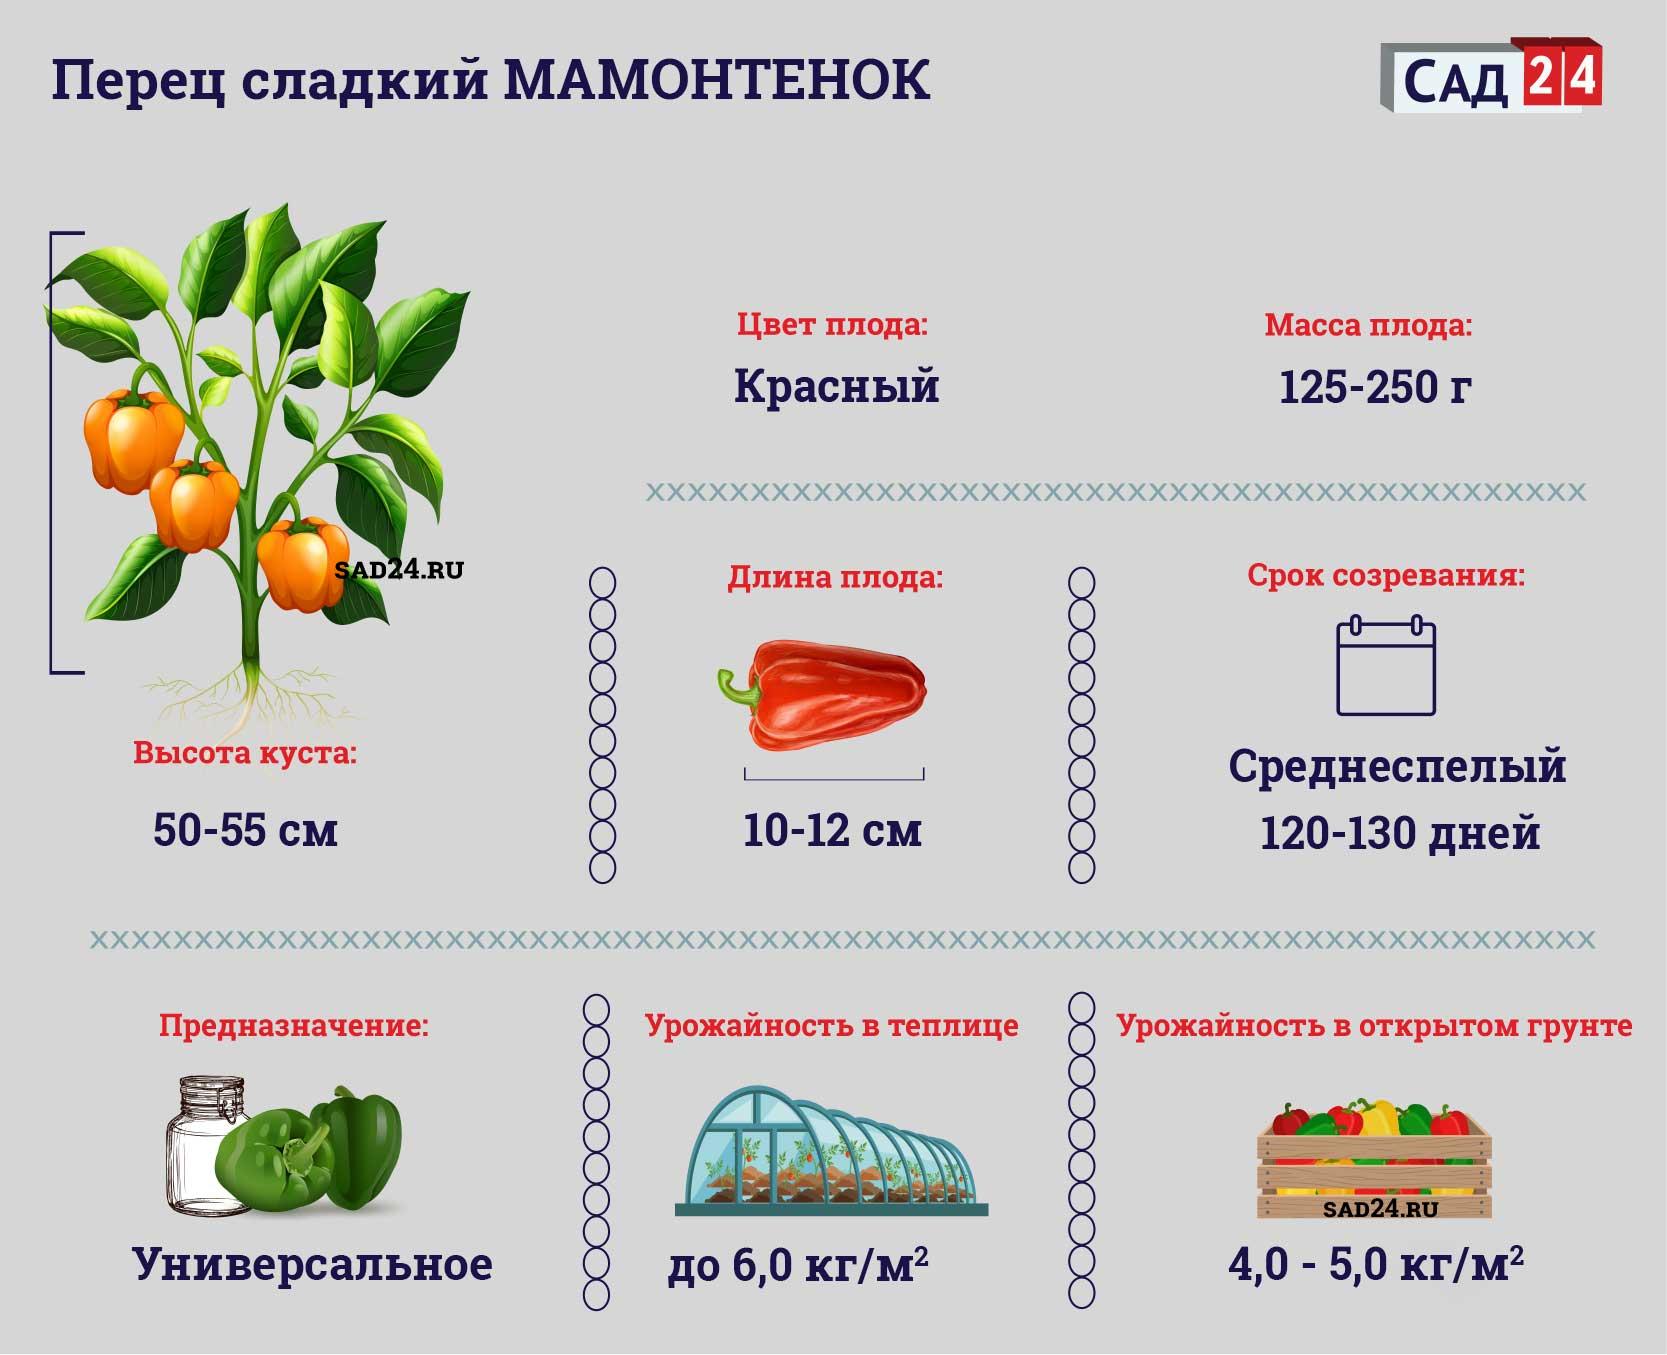 Мамонтенок - https://sad24.ru/